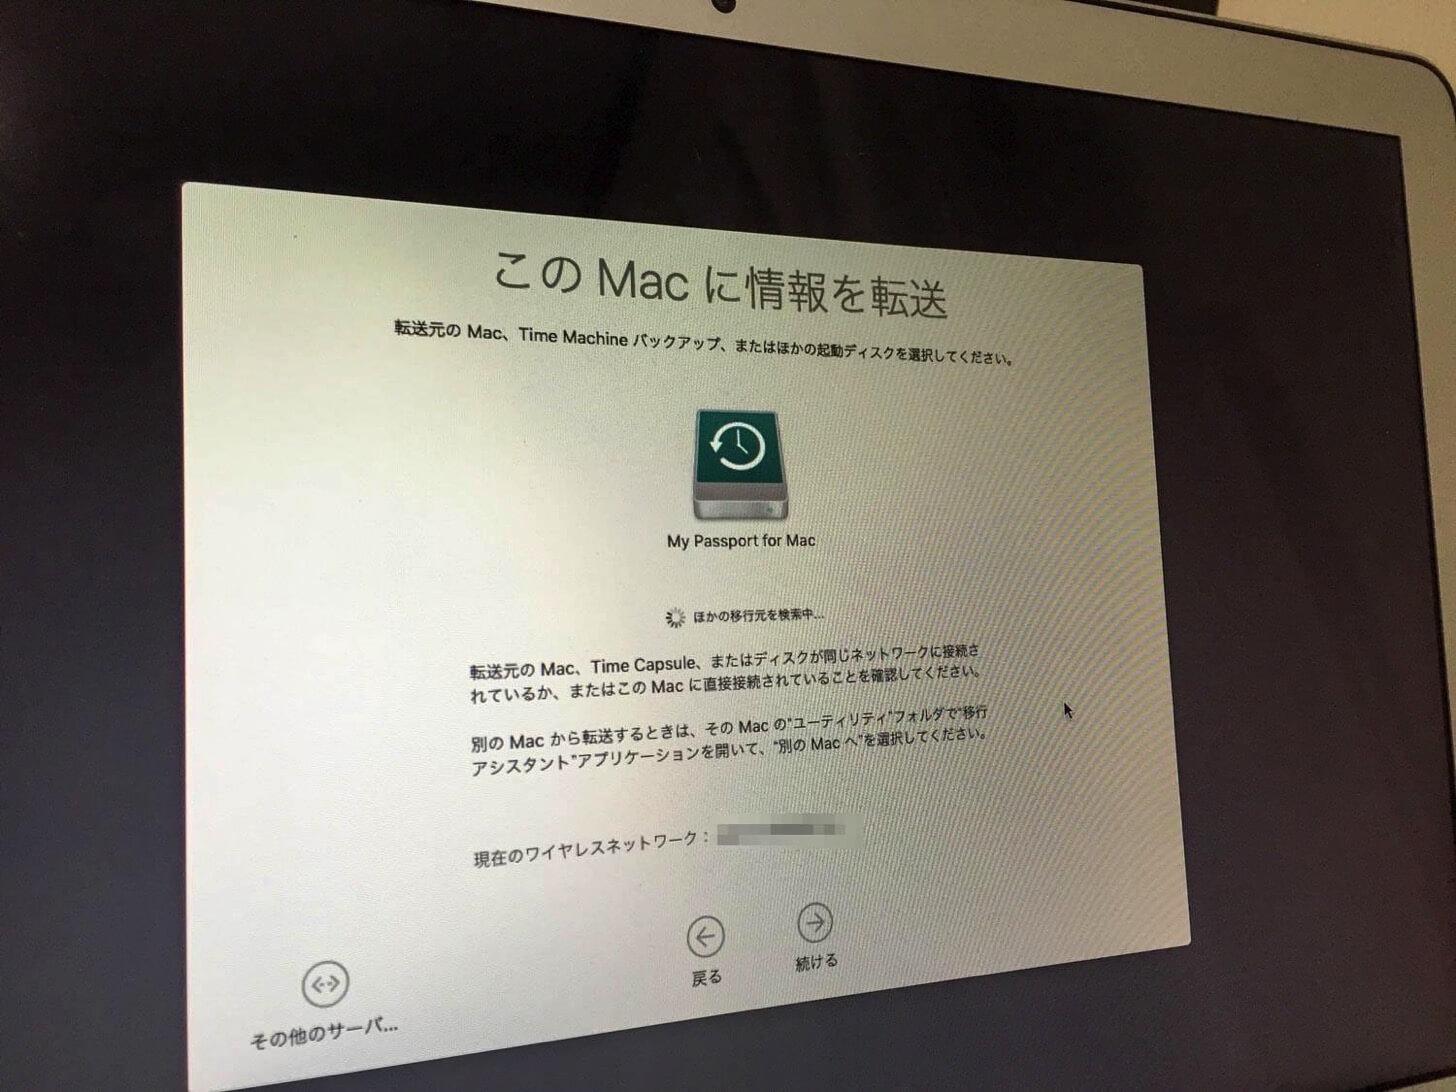 mac-timemachine-backup-restoration5